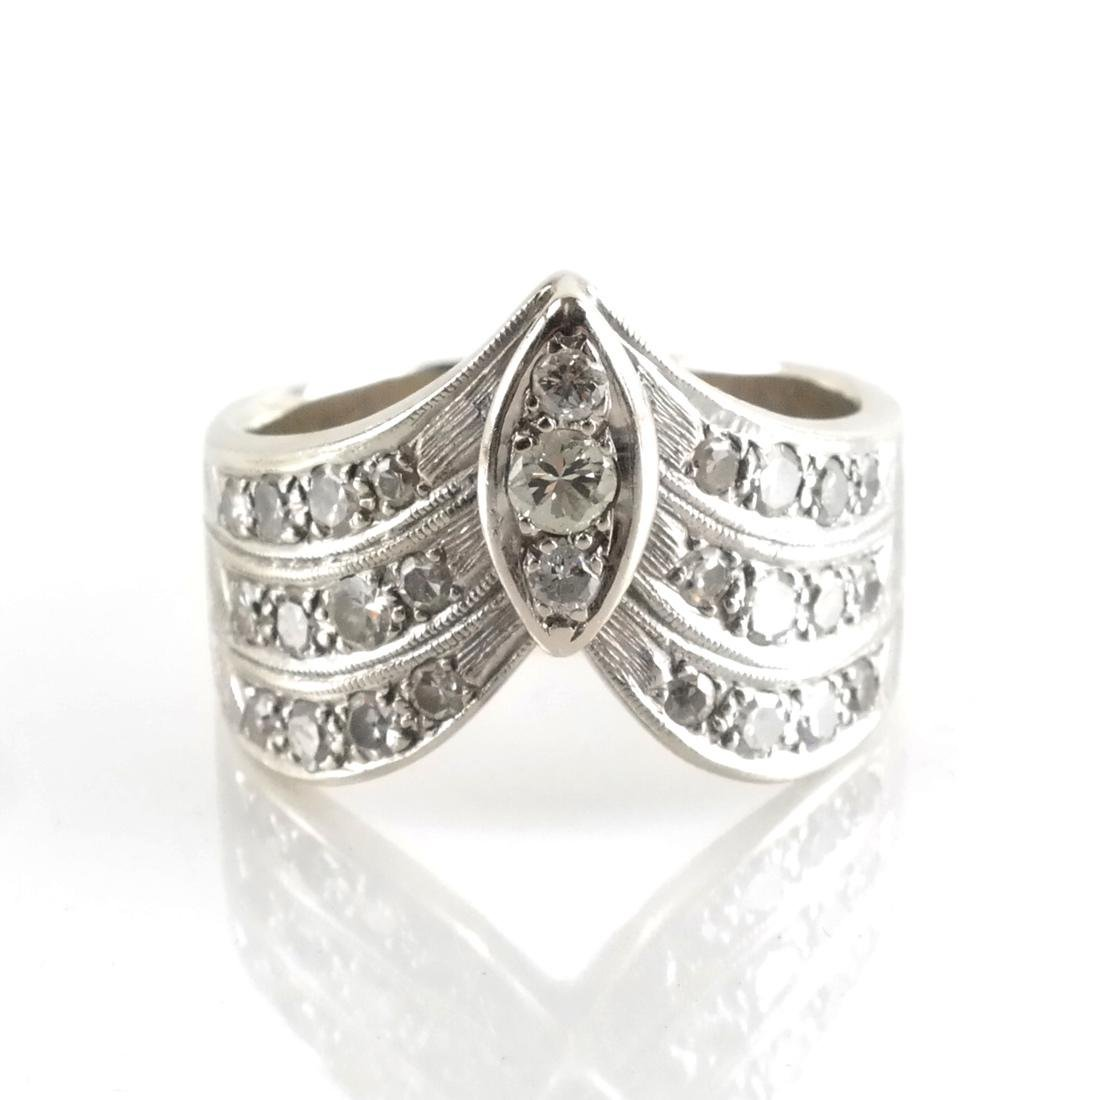 14k WG & Diamond Cocktail Ring